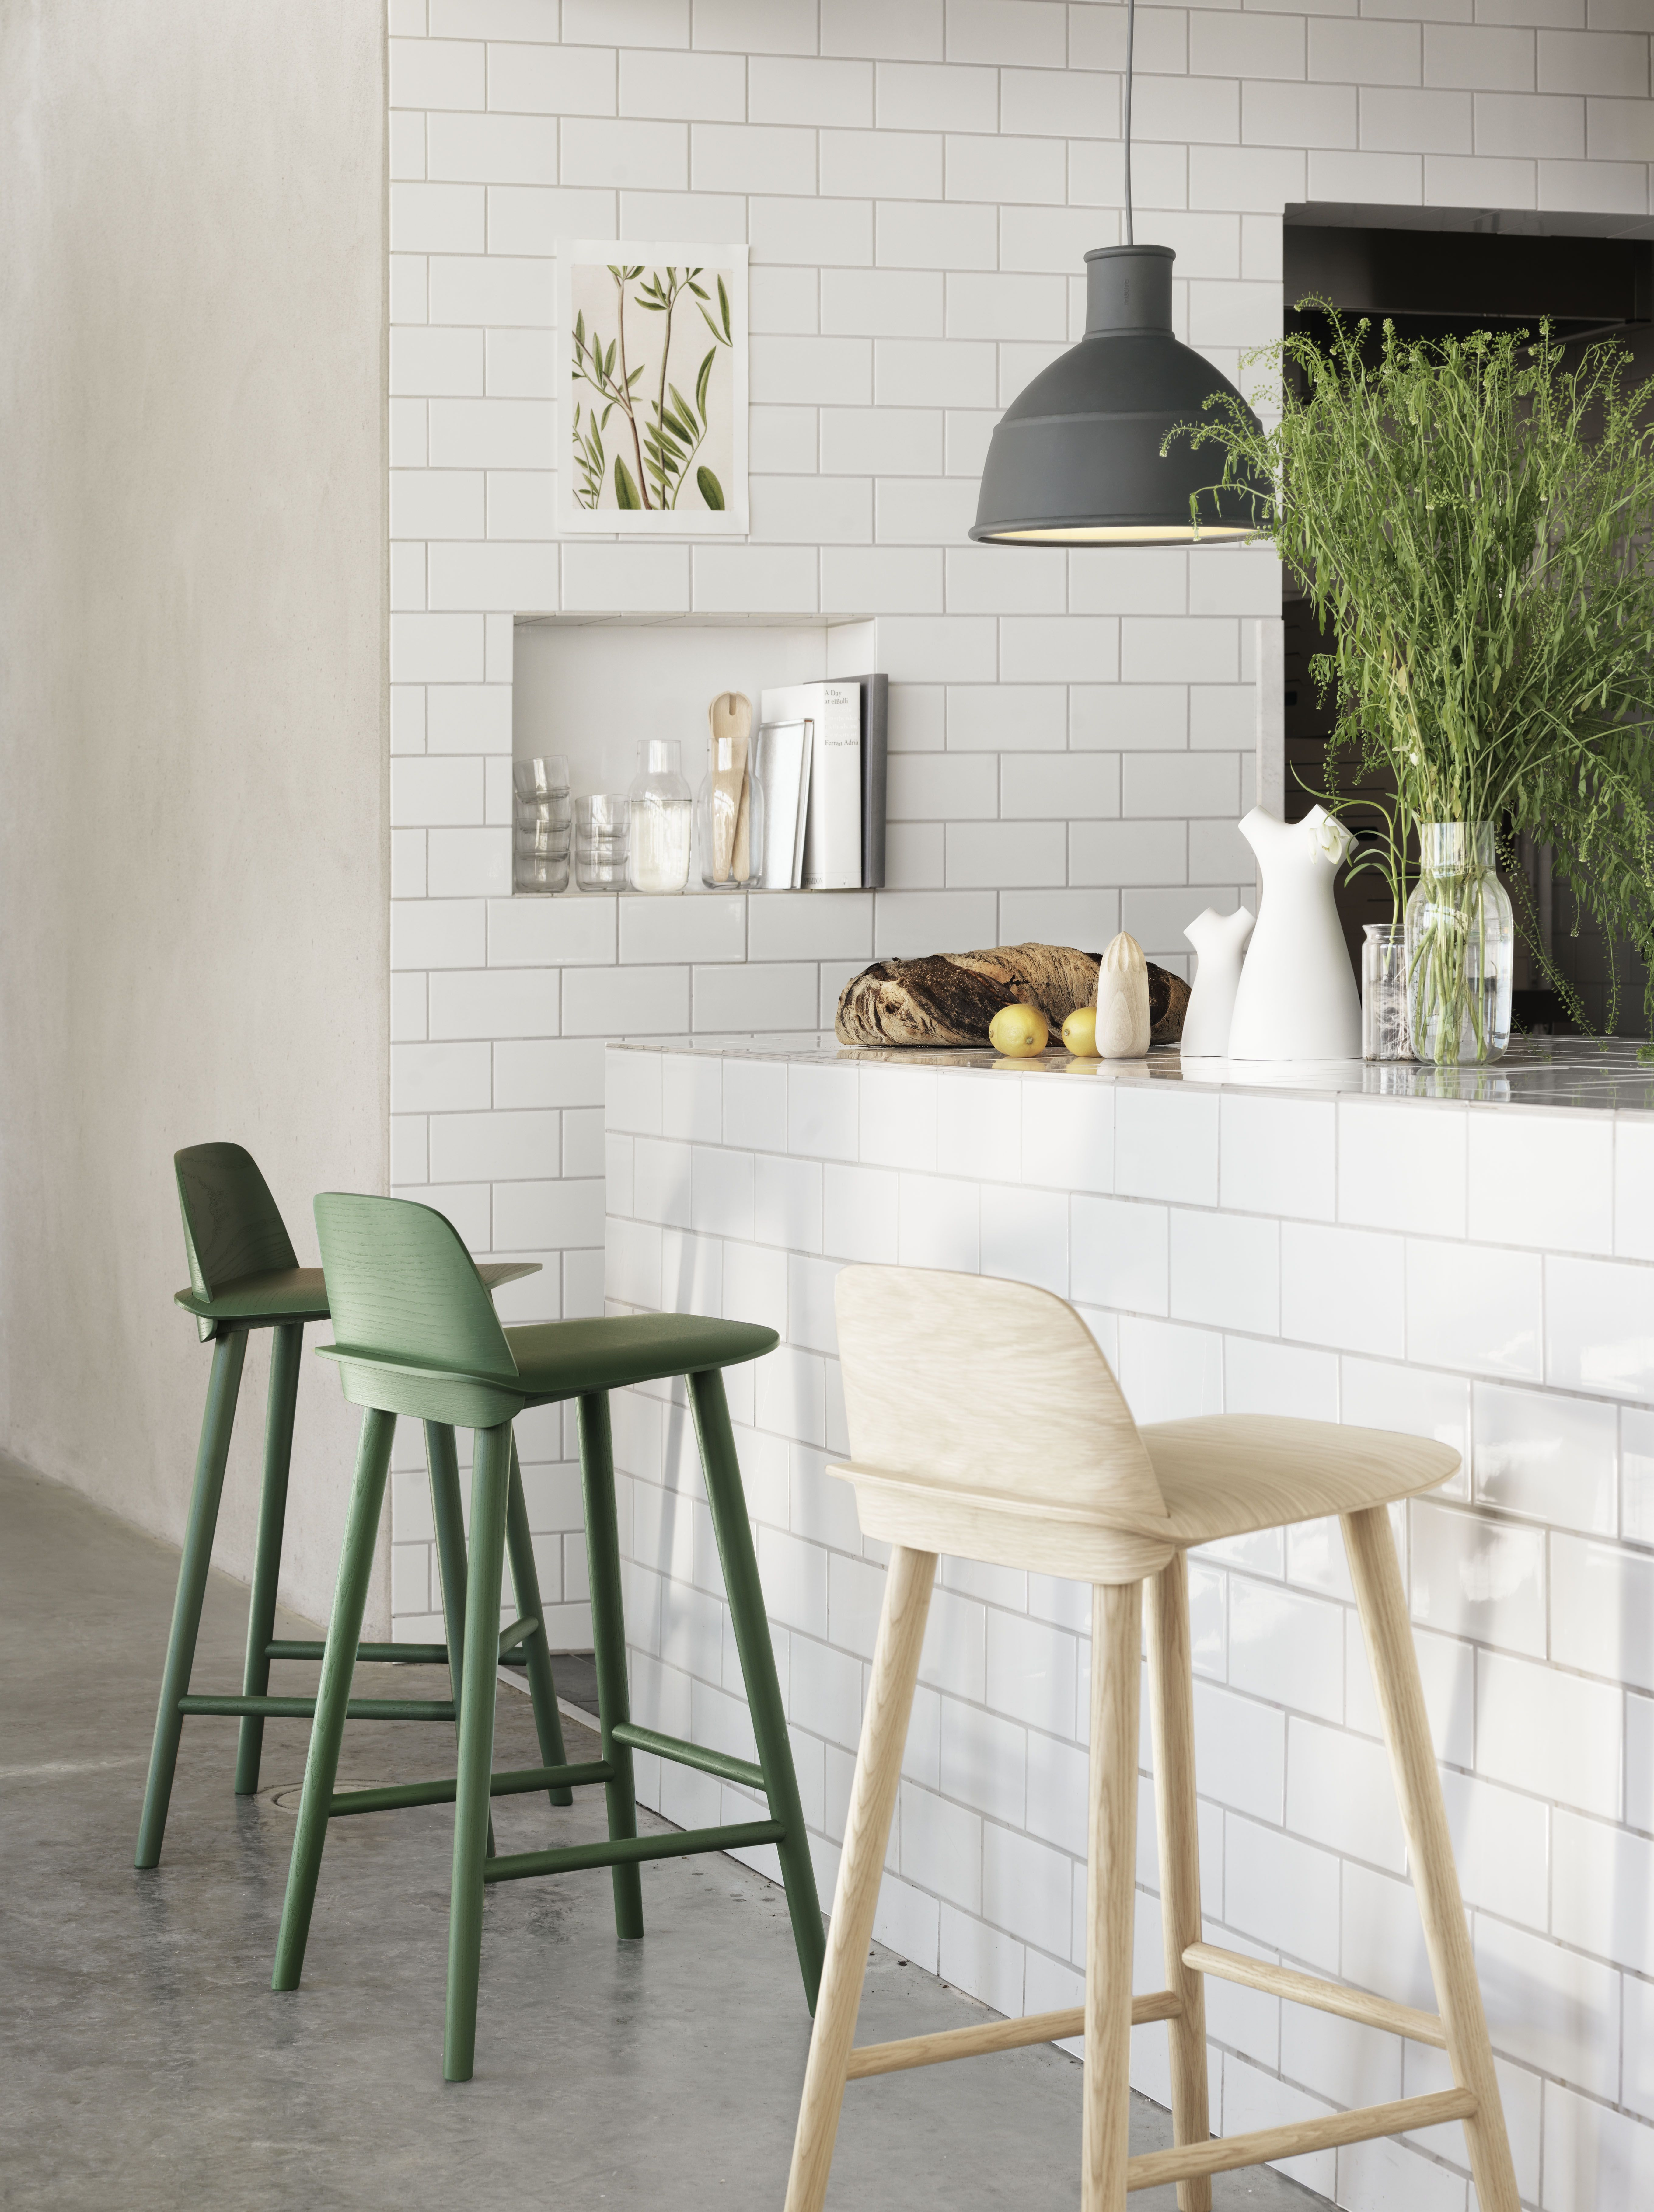 muuto le design scandinave moderne cuisine moderne chaise bar tabouret de bar